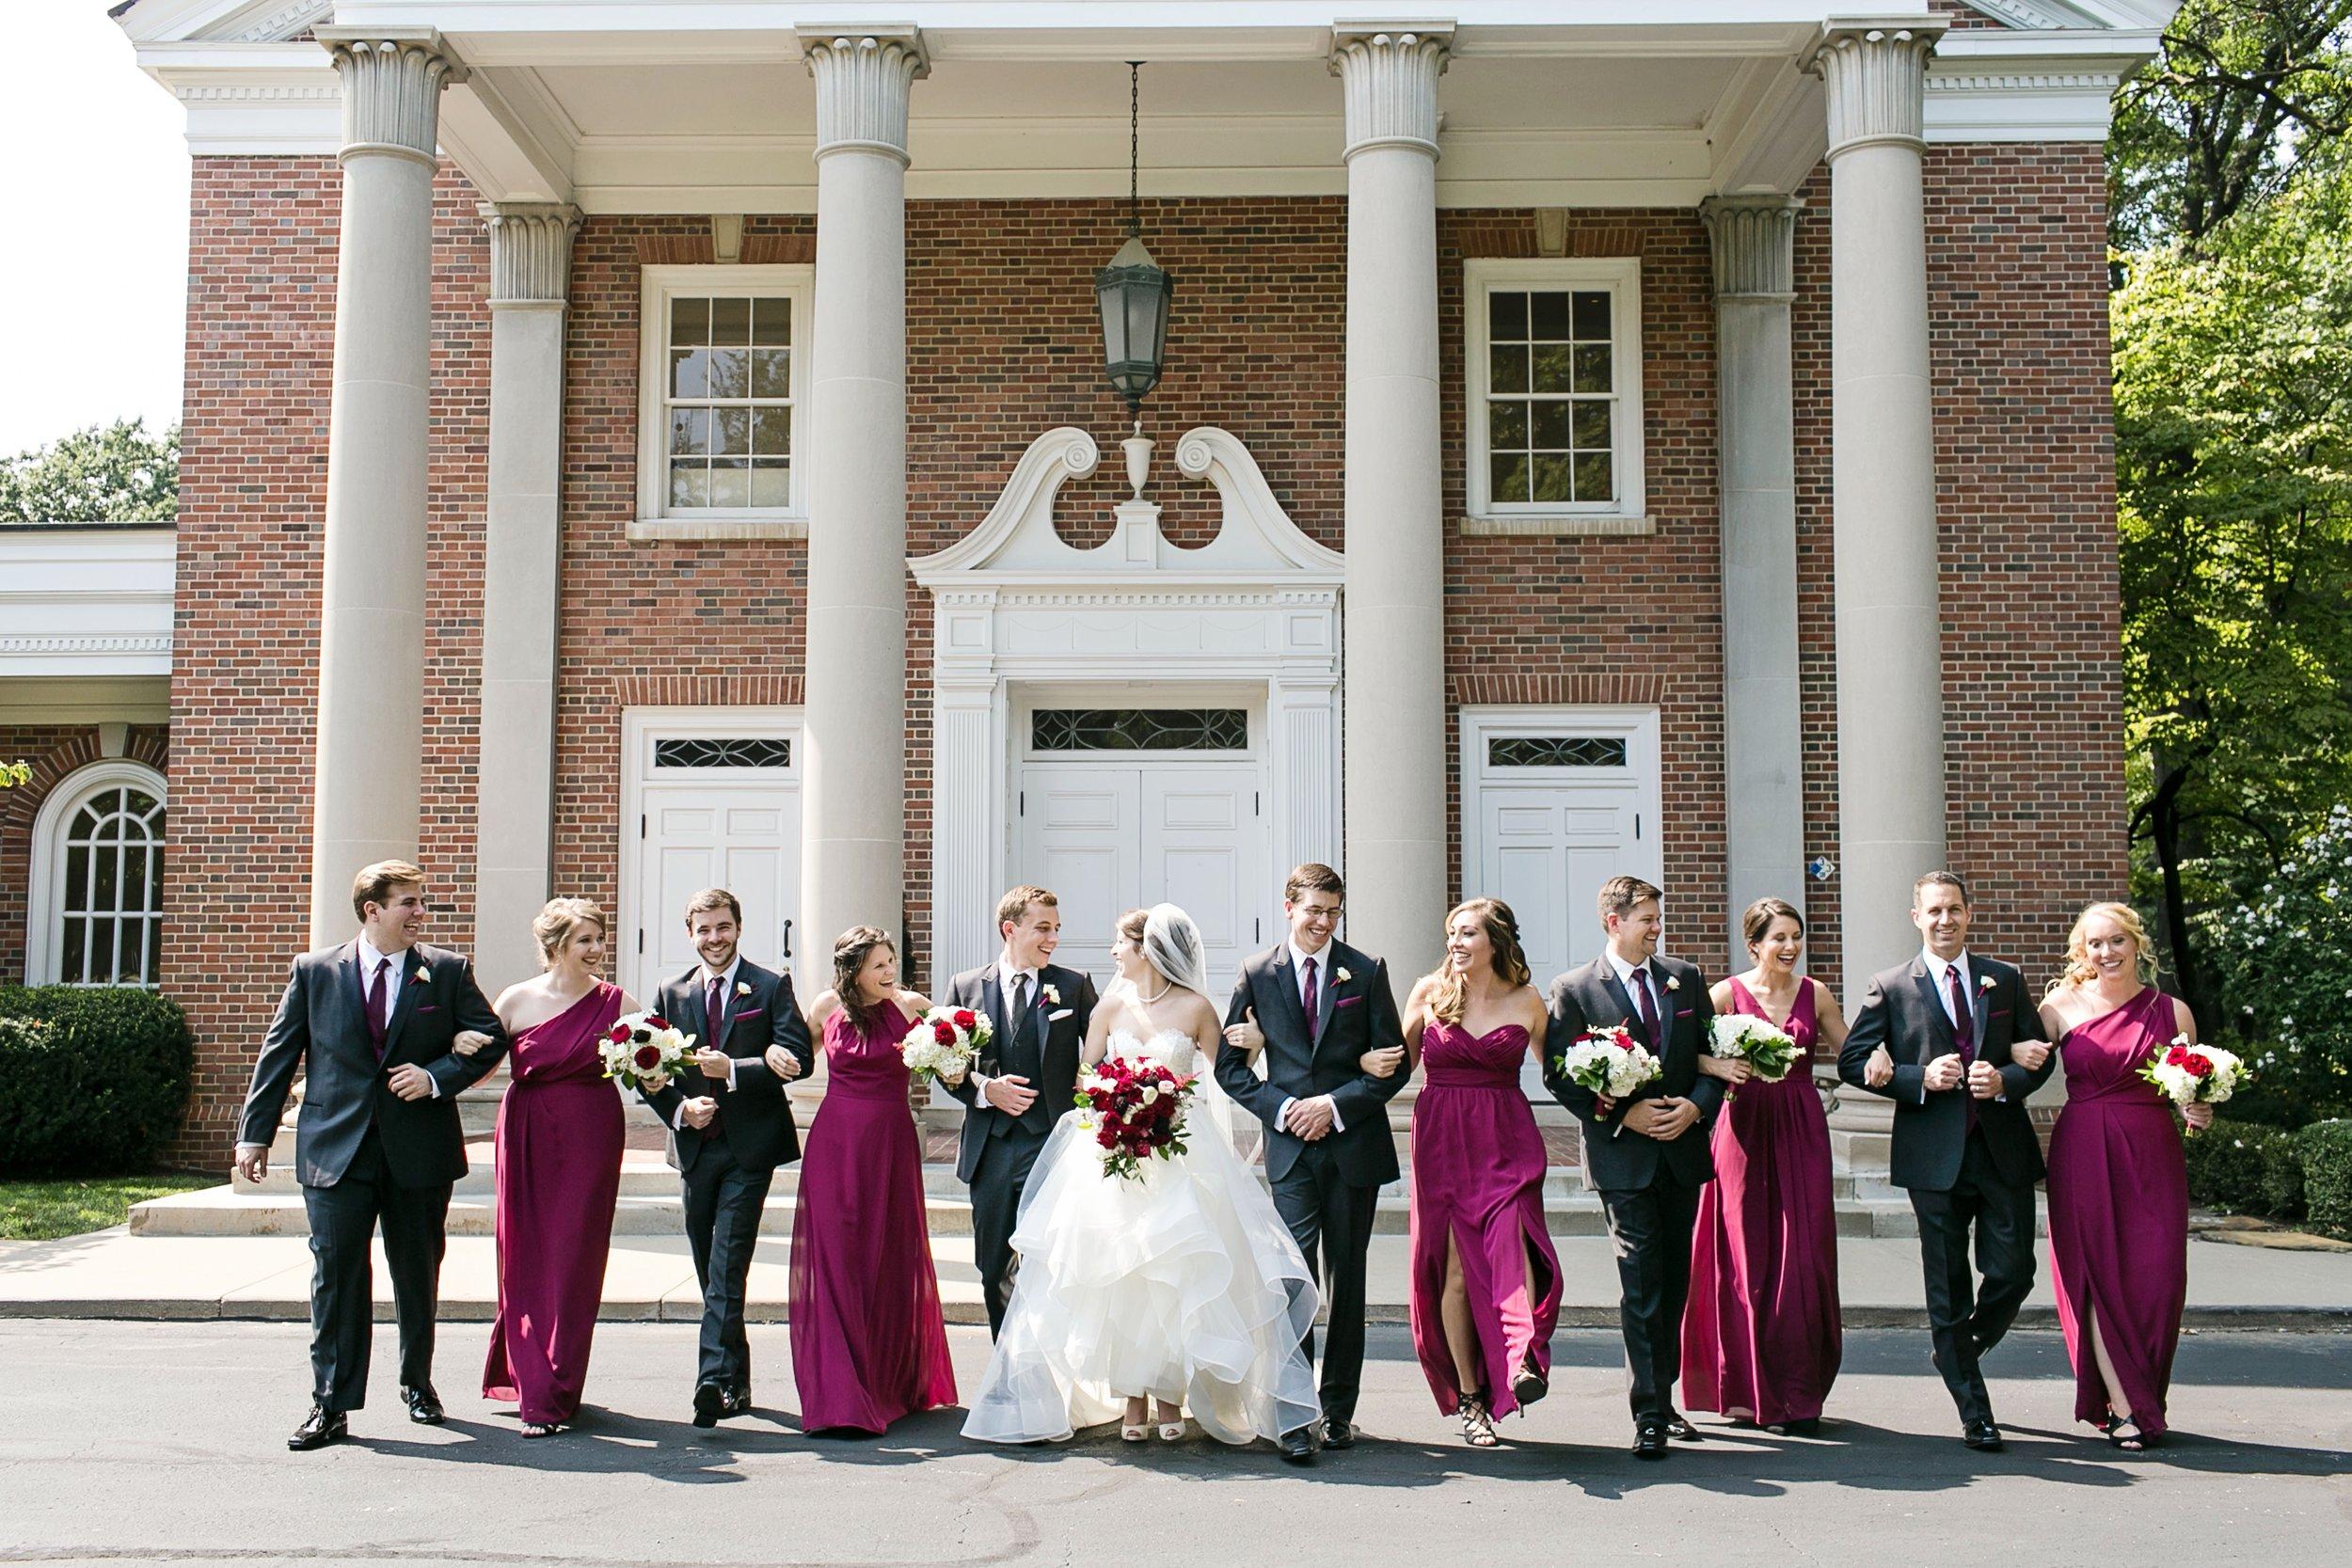 2017Sept9-Kay-Wedding-MissionTheatre-0315.jpg